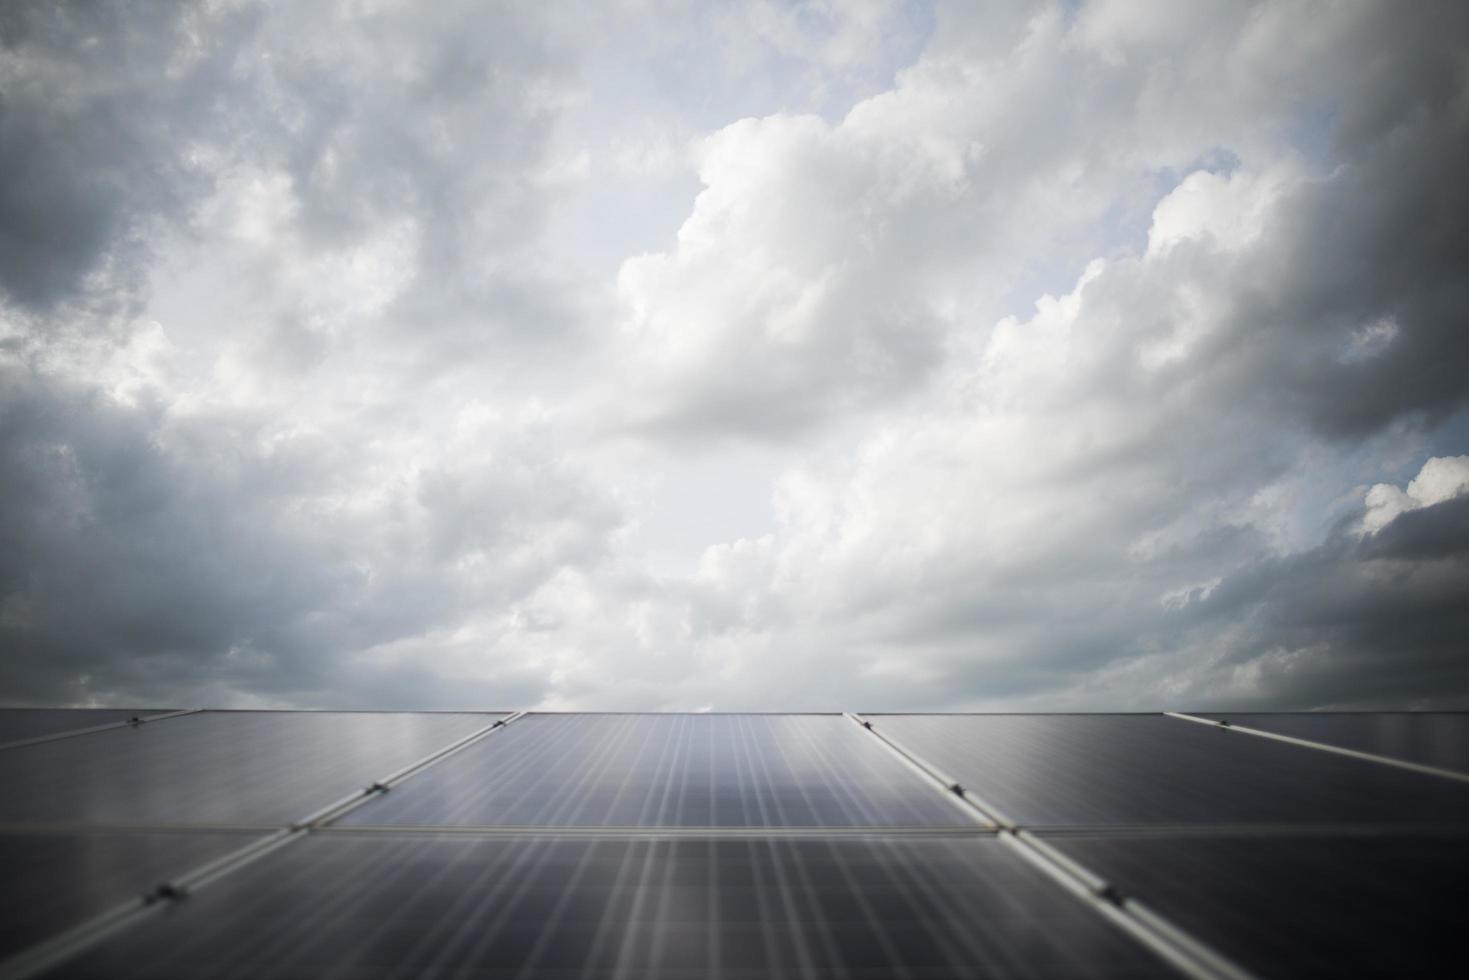 central eléctrica de la granja de la célula solar foto